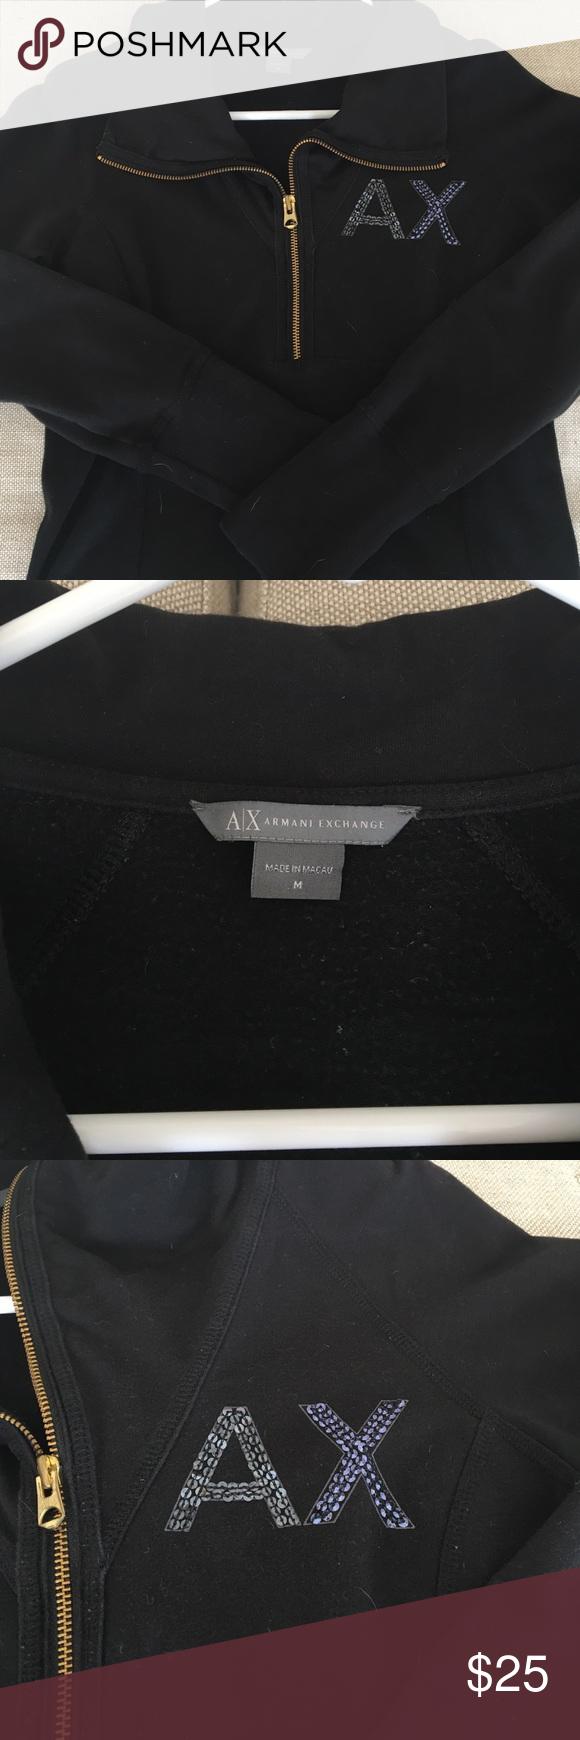 Armani Exchange black women's sweater | Black women, Turtlenecks ...